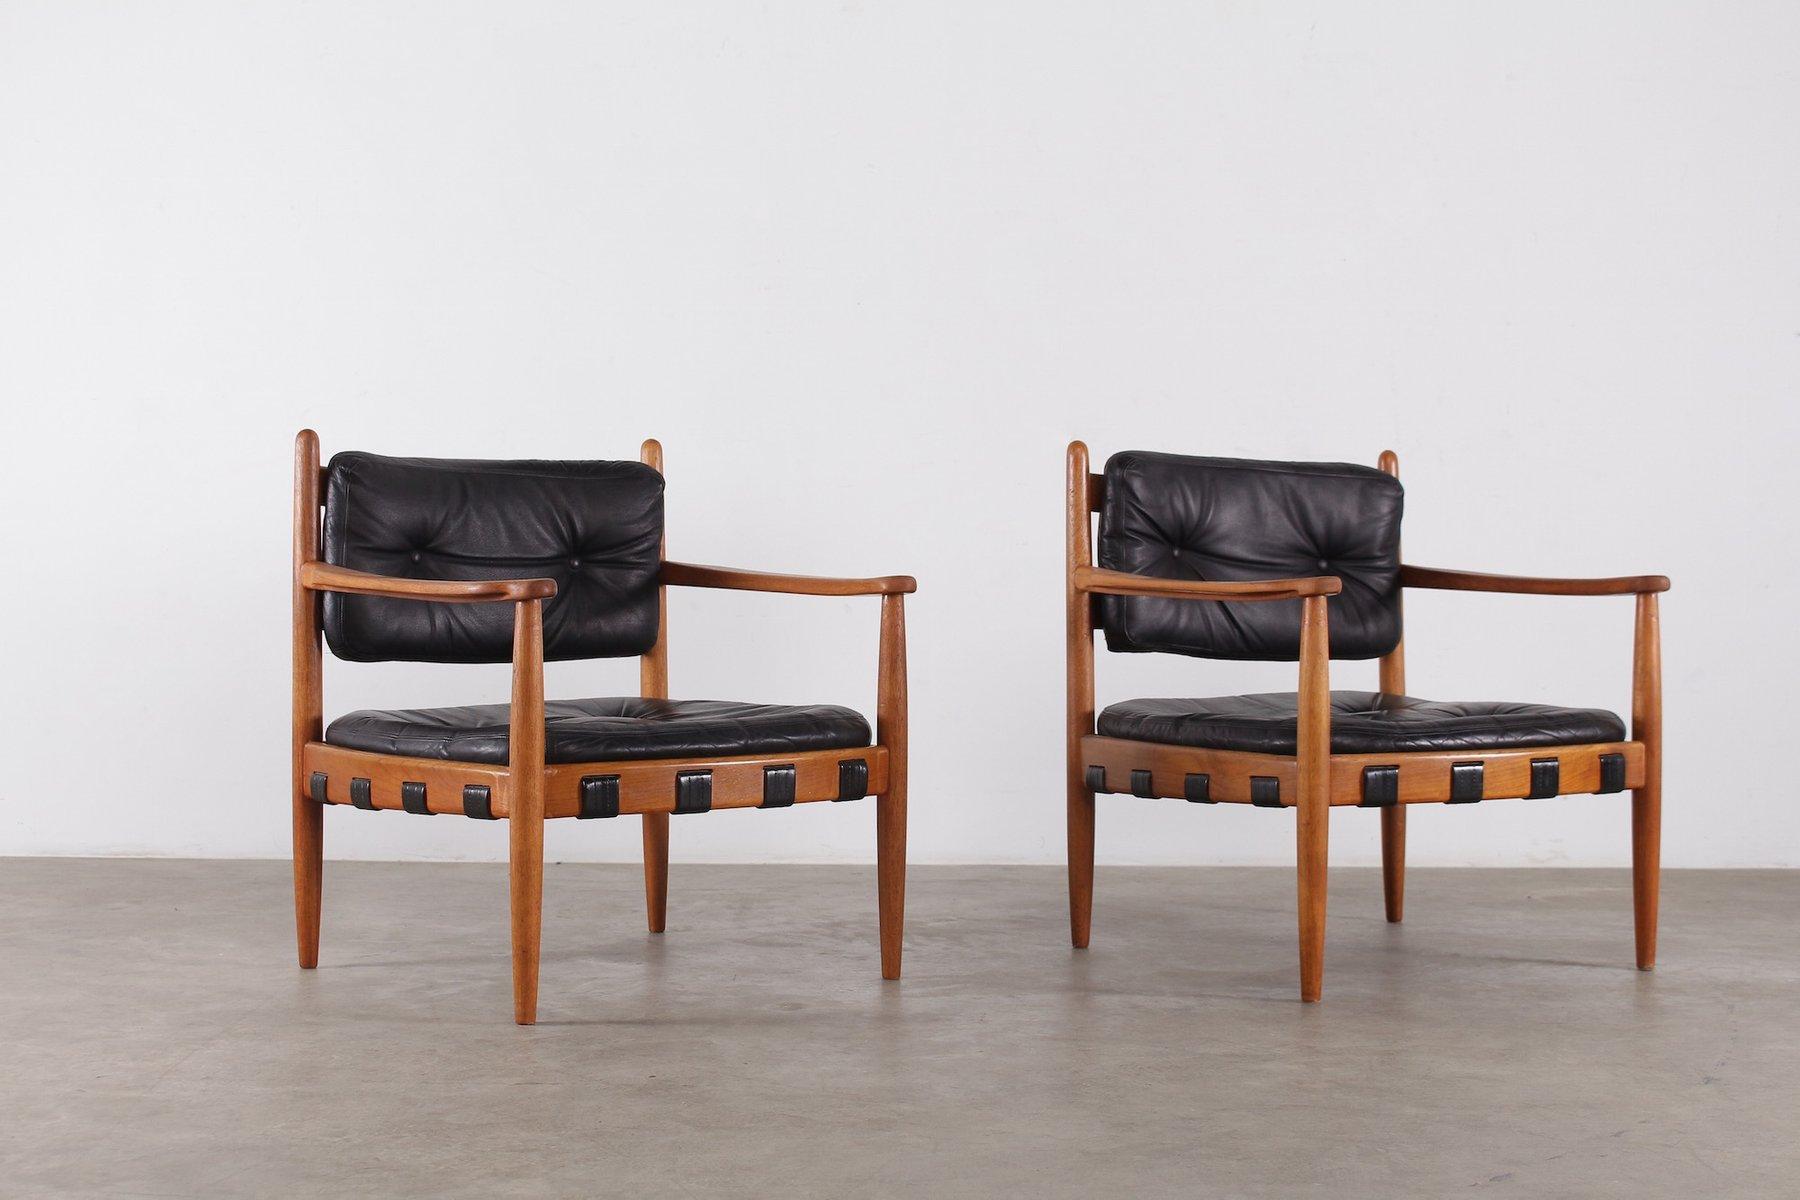 Skandinavische schwarze Vintage Leder Sessel von Eric Merthen, 2er Set